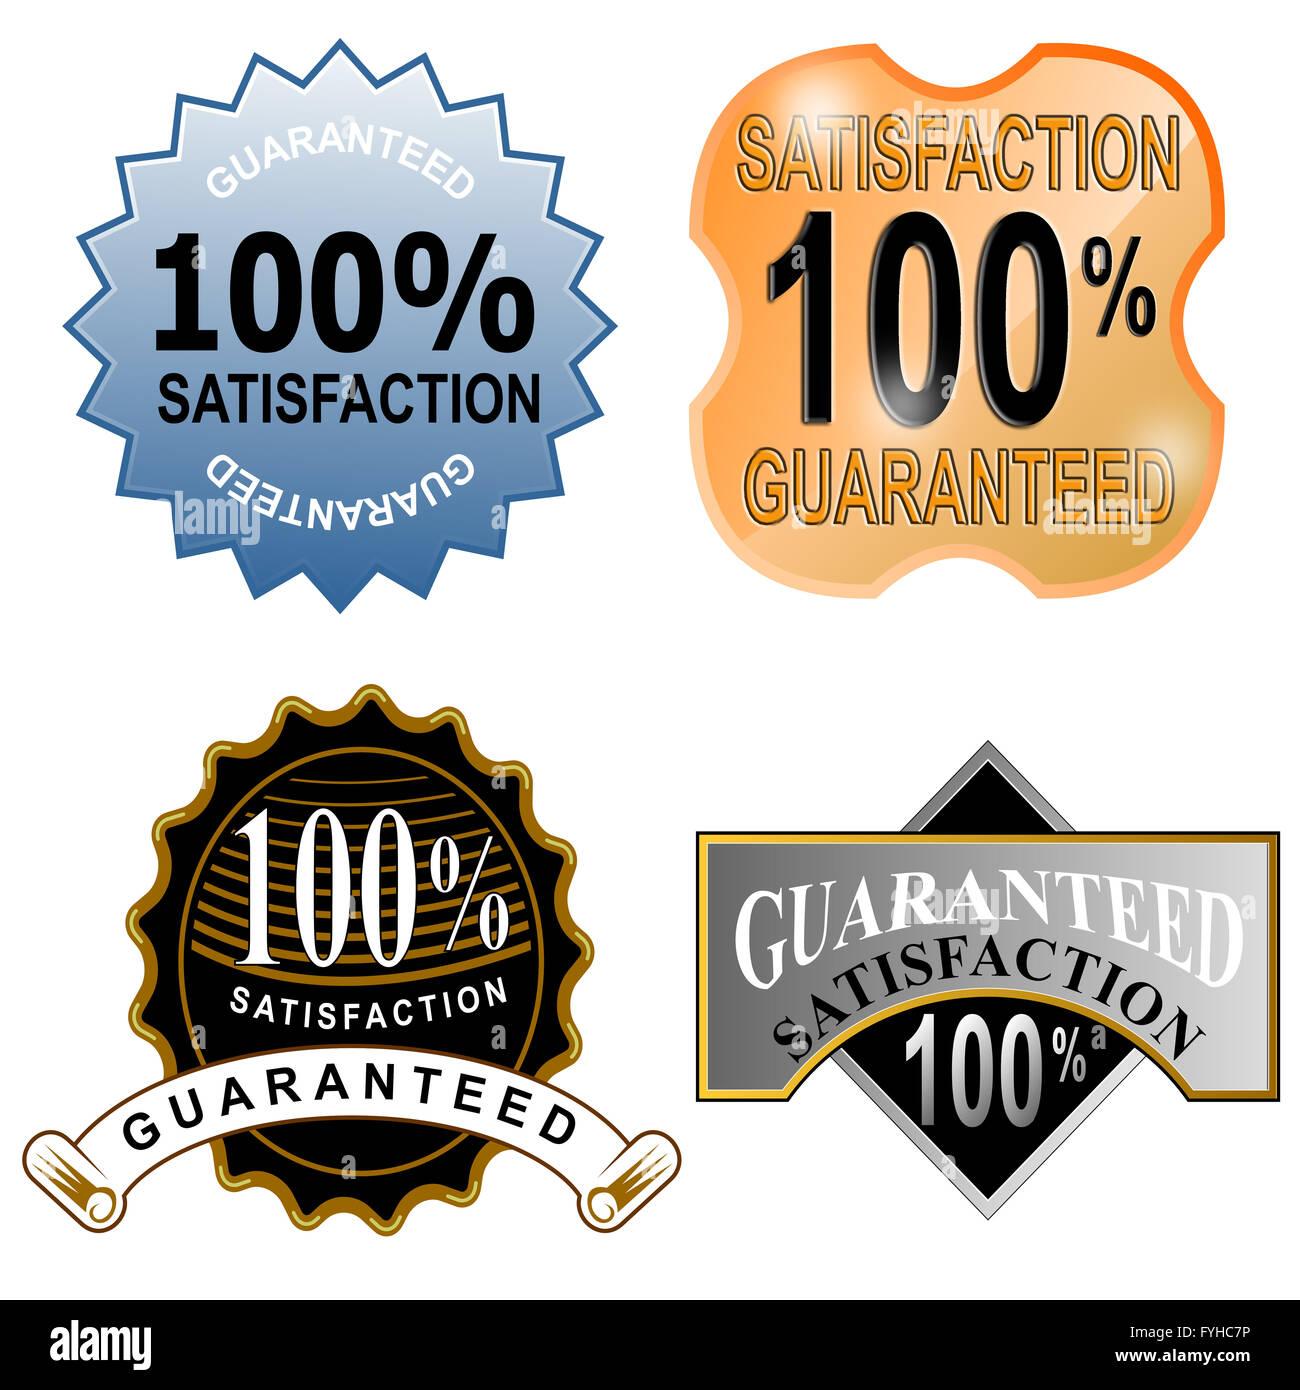 100% Satisfaction Guaranteed - Stock Image